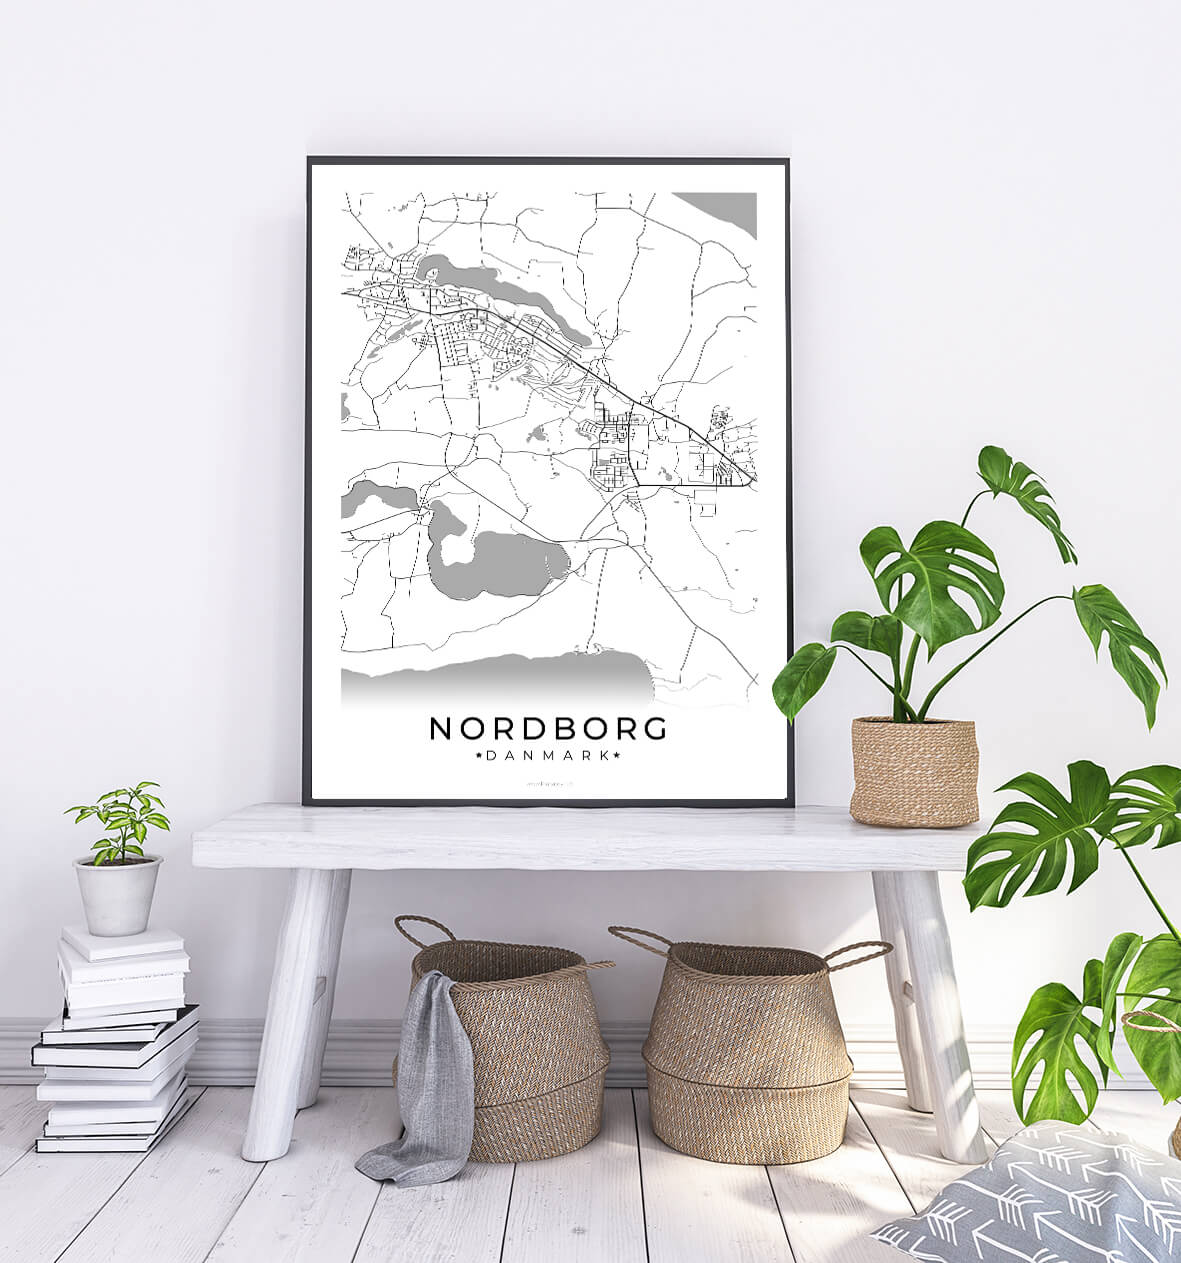 Nordborg-hvid-byplakat-3